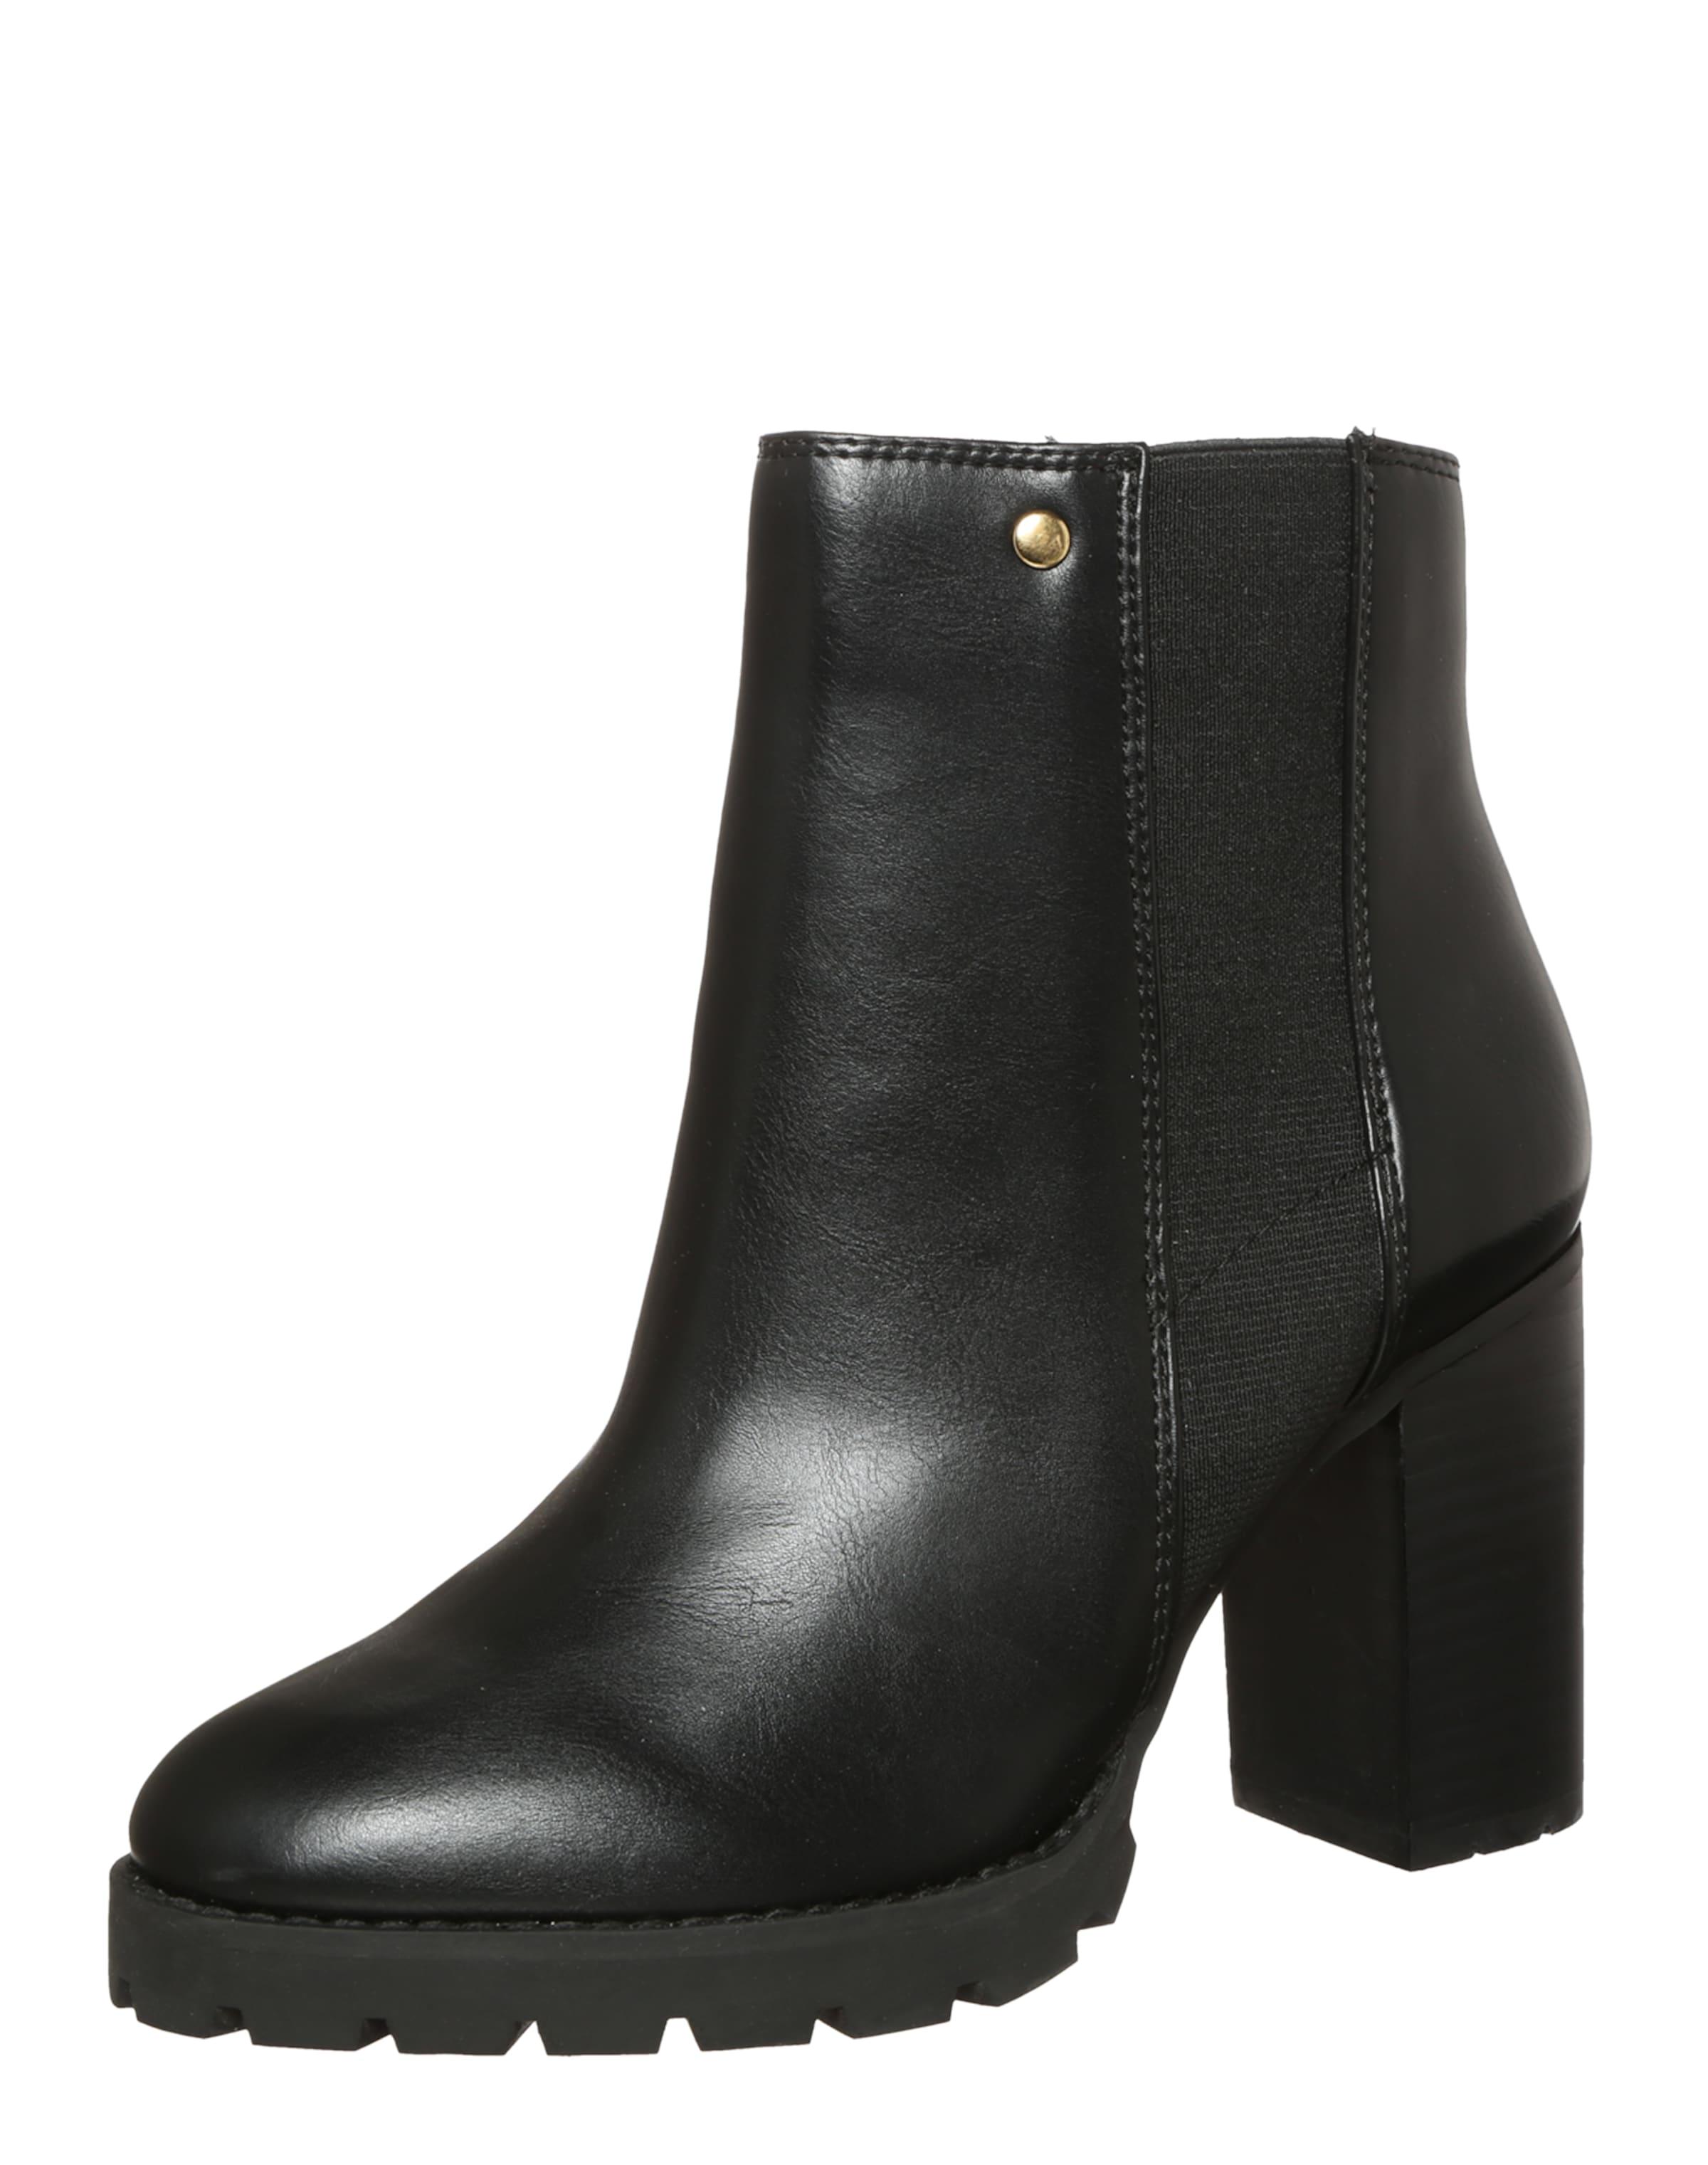 BUFFALO Chelsea Stiefelette Verschleißfeste billige Schuhe